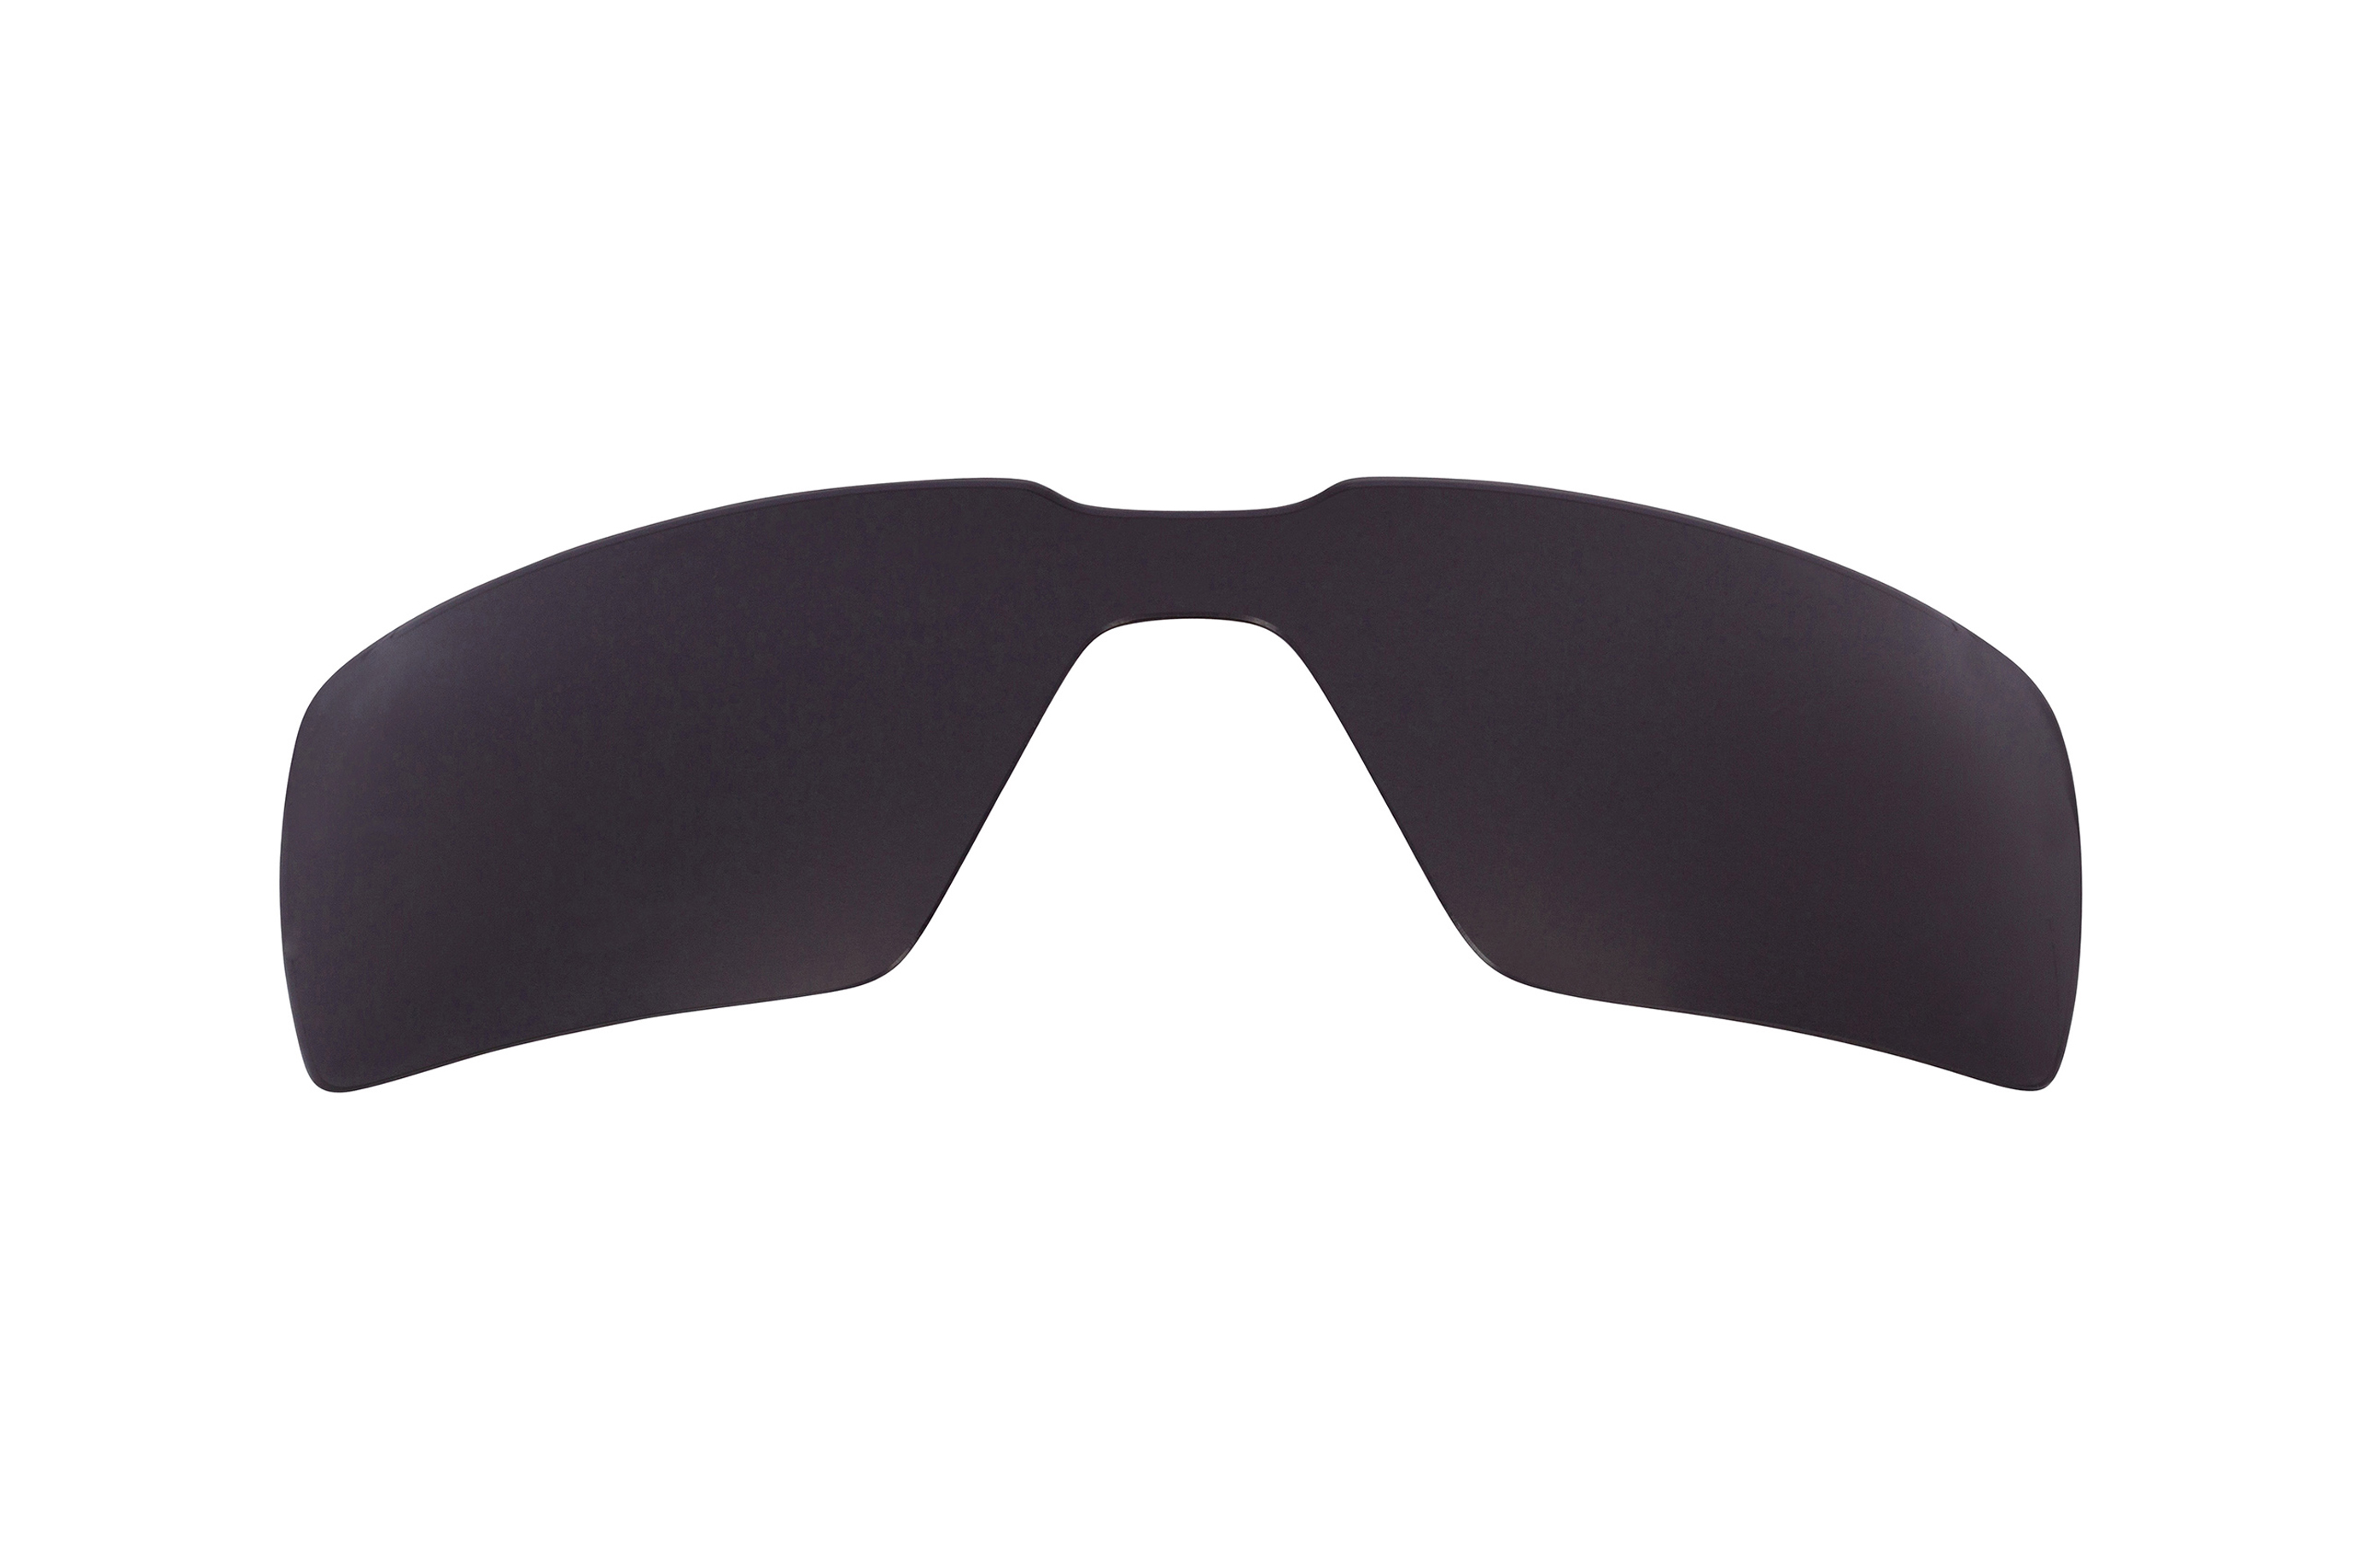 085a95fe8e Oakley Probation Polarized Replacement Lenses « Heritage Malta